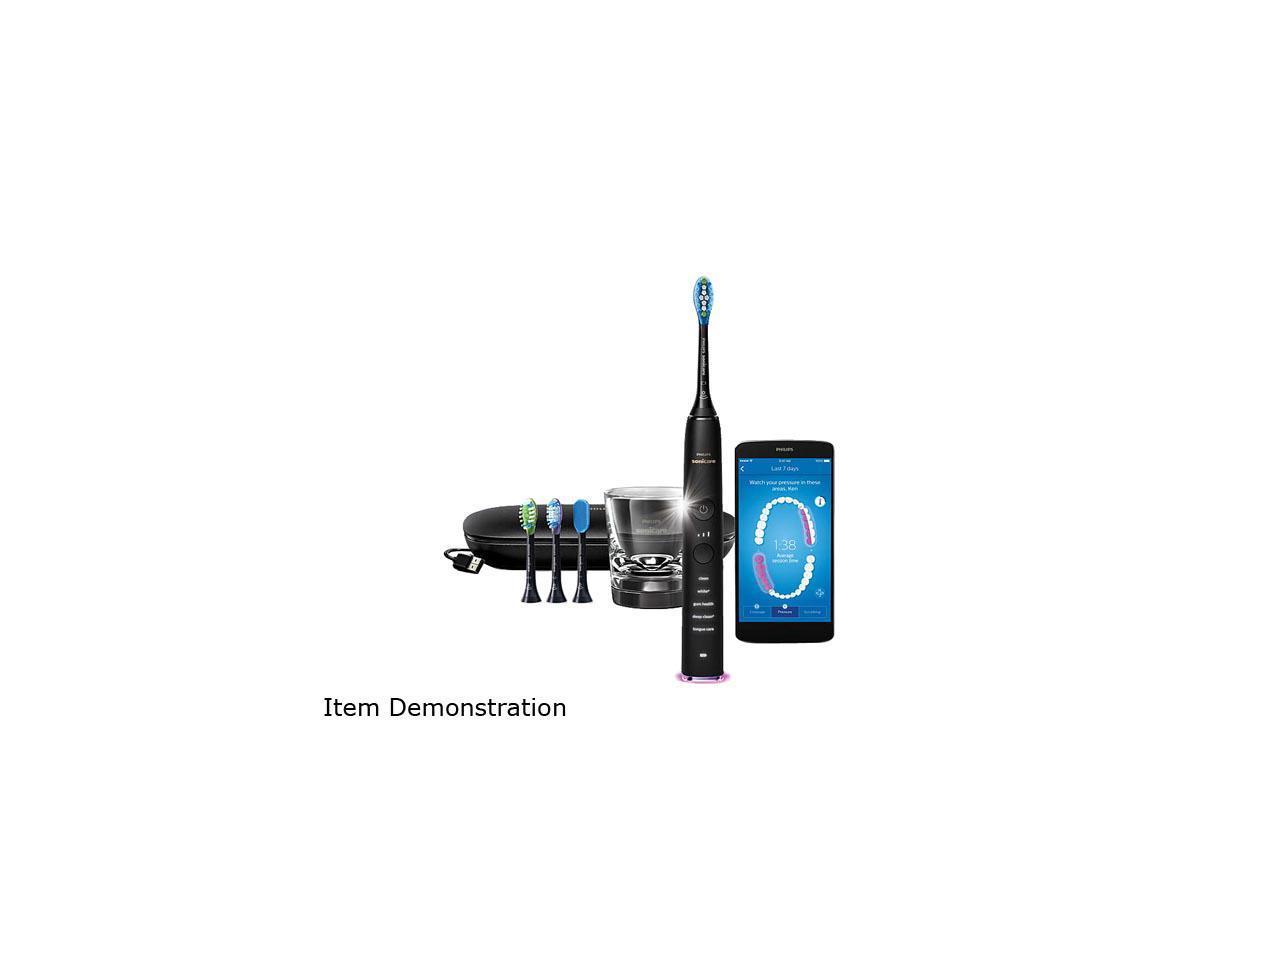 Philips Sonicare DiamondClean Smart 9500 Series Electric